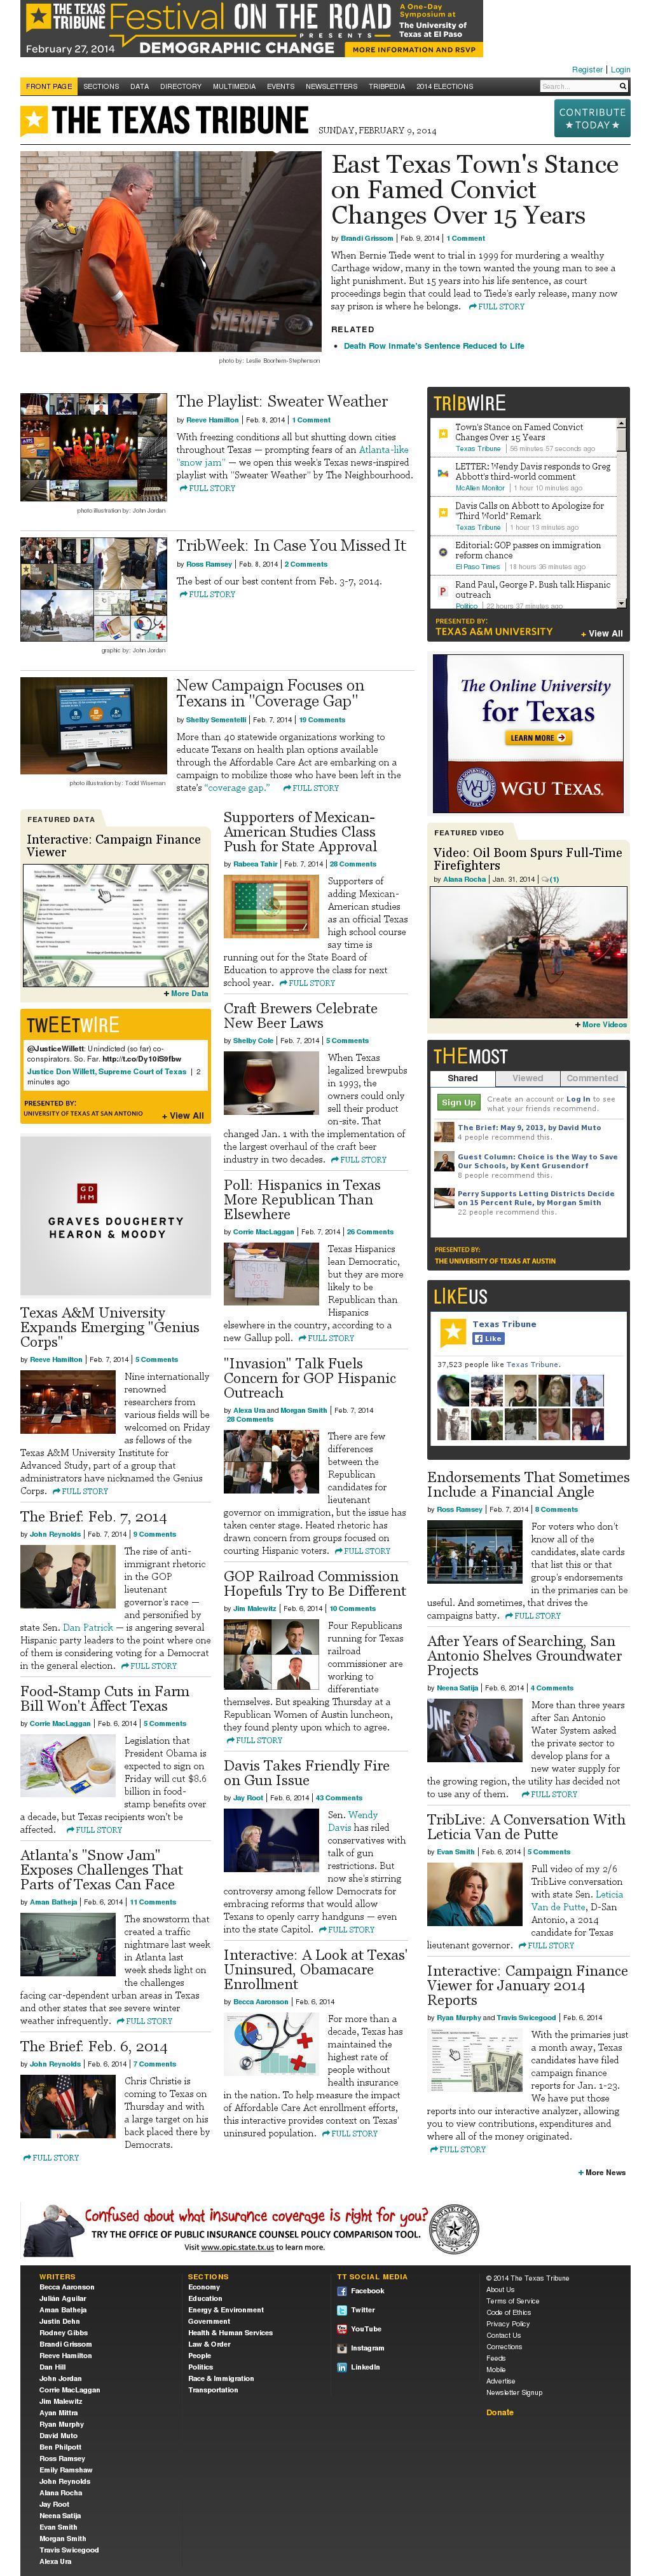 The Texas Tribune at Sunday Feb. 9, 2014, 7:19 p.m. UTC